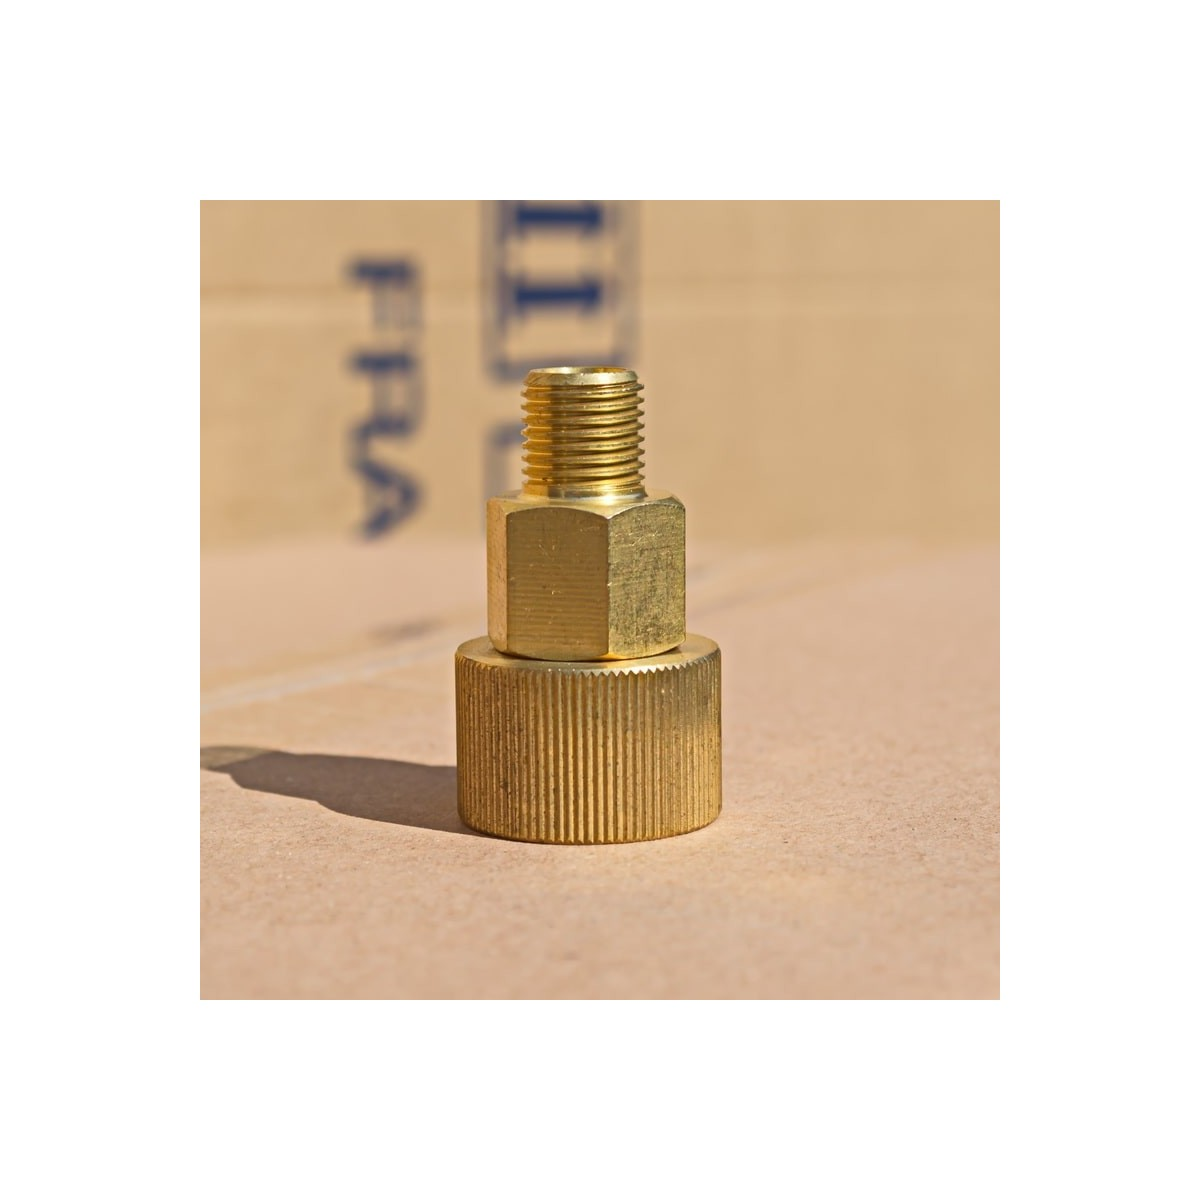 Argila auto - Clay bar - GLINKA K2 260g